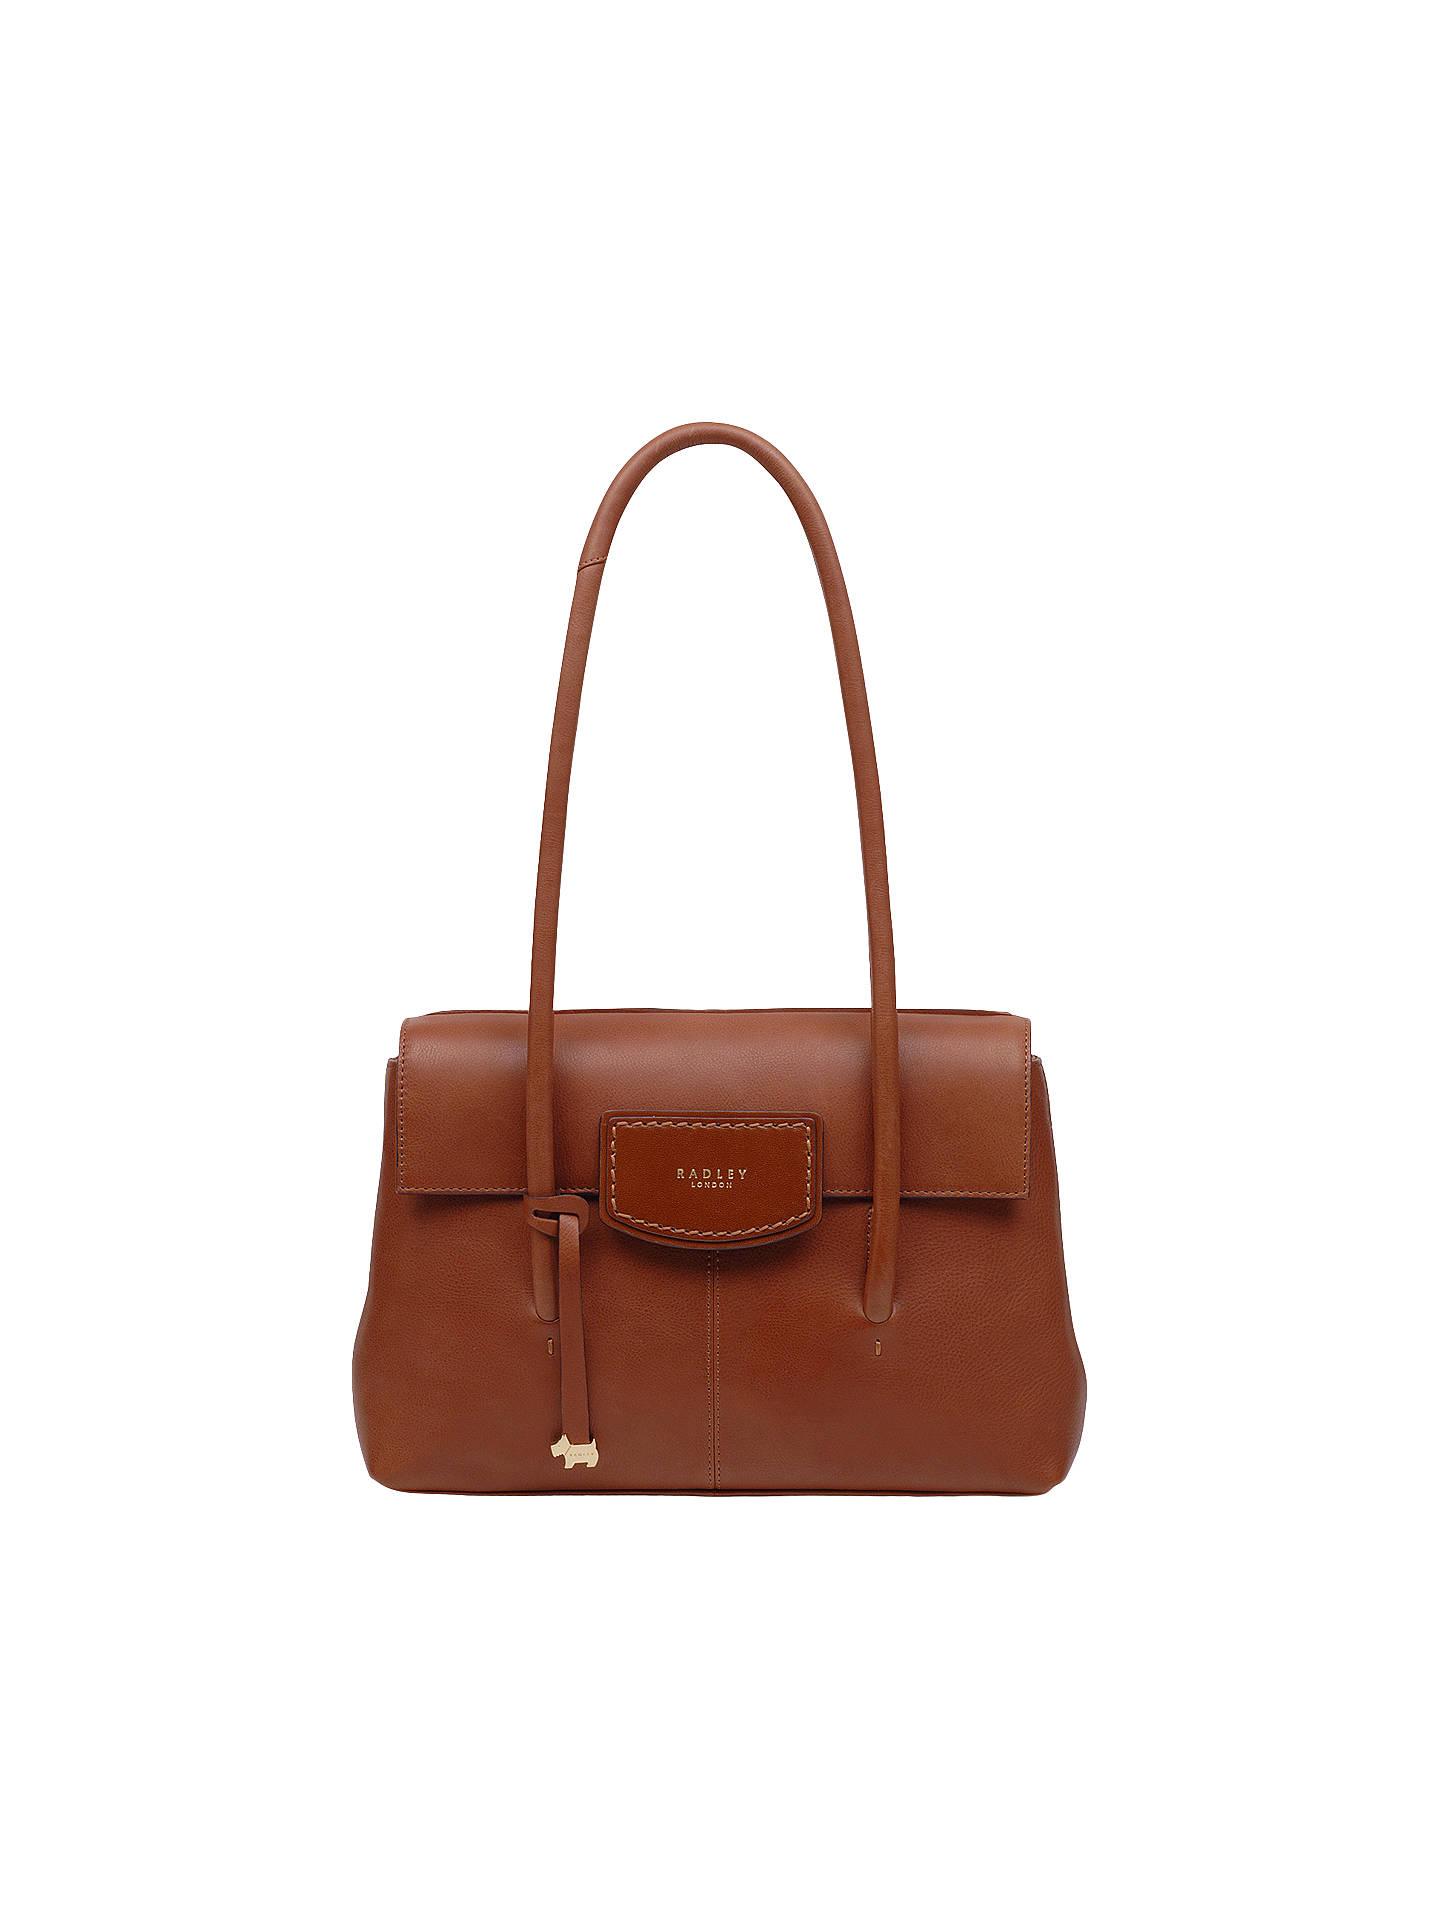 4d20c743127a Buy Radley Burnham Beeches Leather Medium Flapover Tote Bag, Tan Online at  johnlewis.com ...